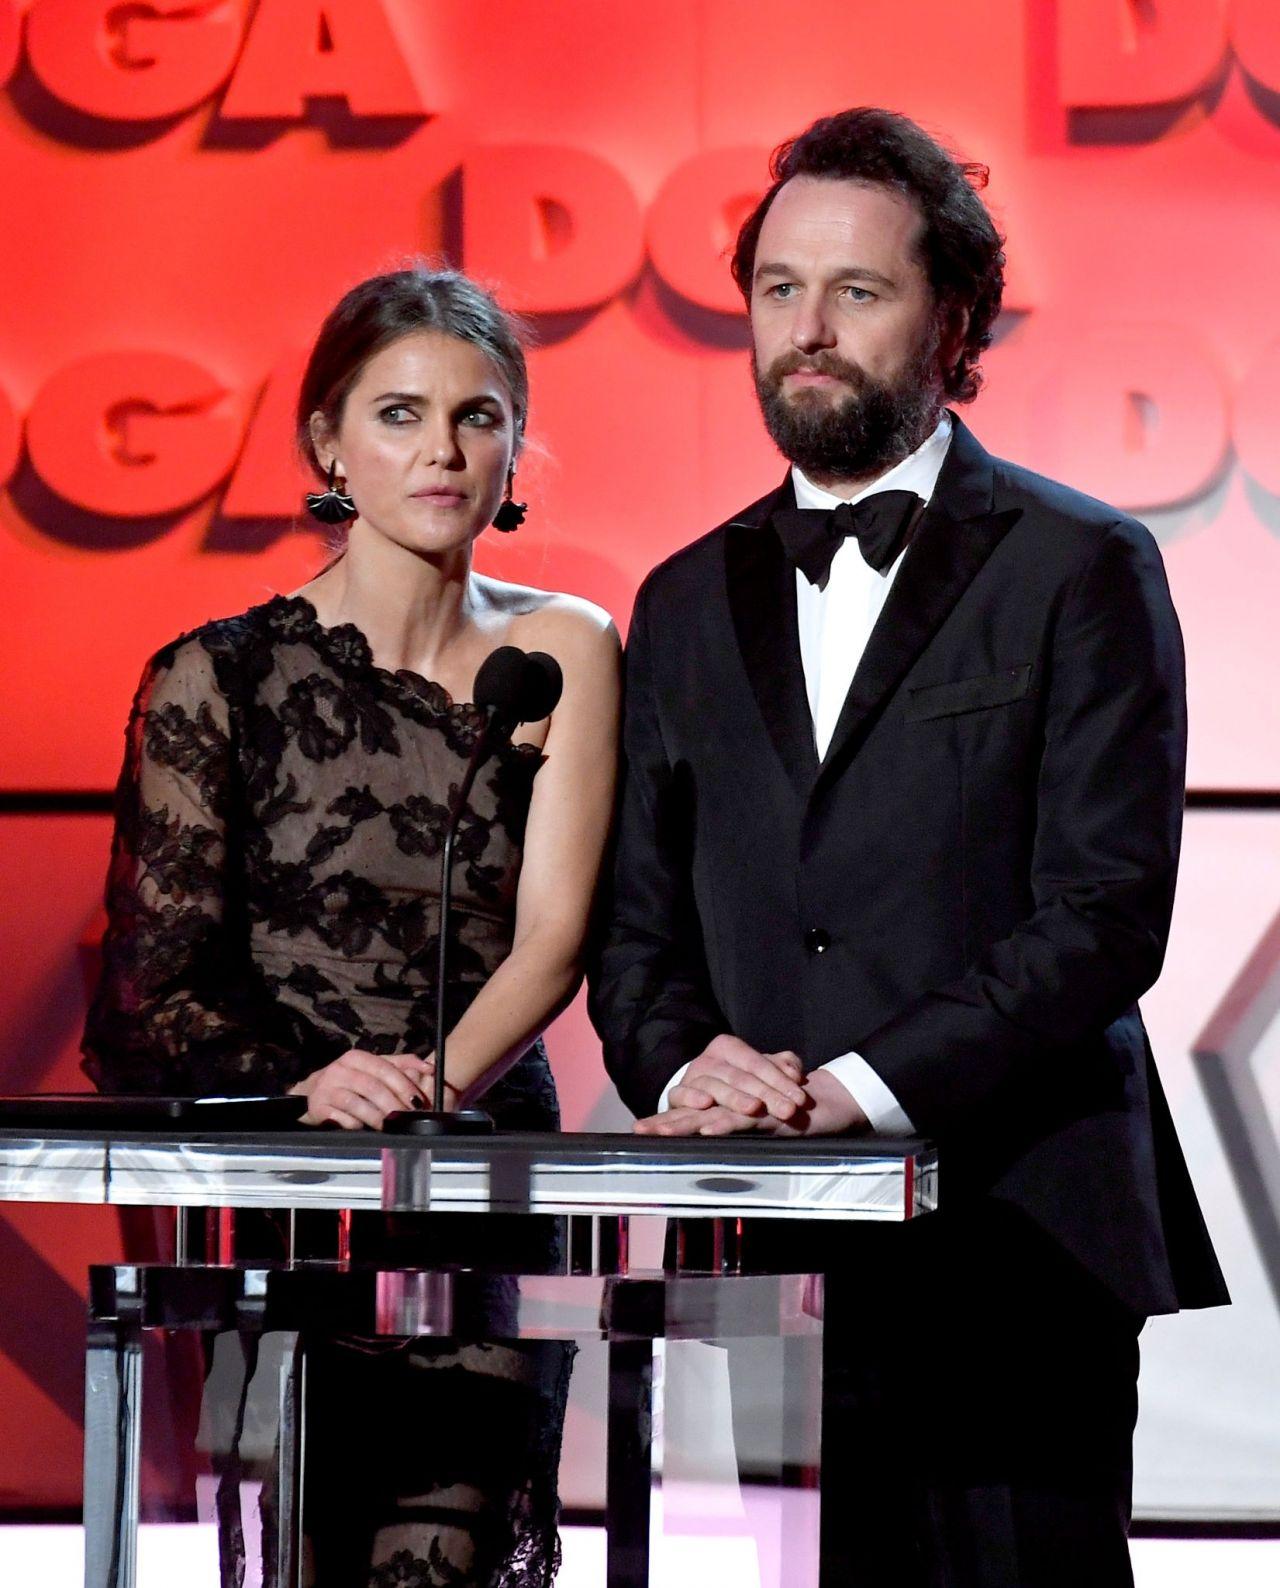 https://celebmafia.com/wp-content/uploads/2019/02/keri-russell-2019-directors-guild-of-america-awards-10.jpg